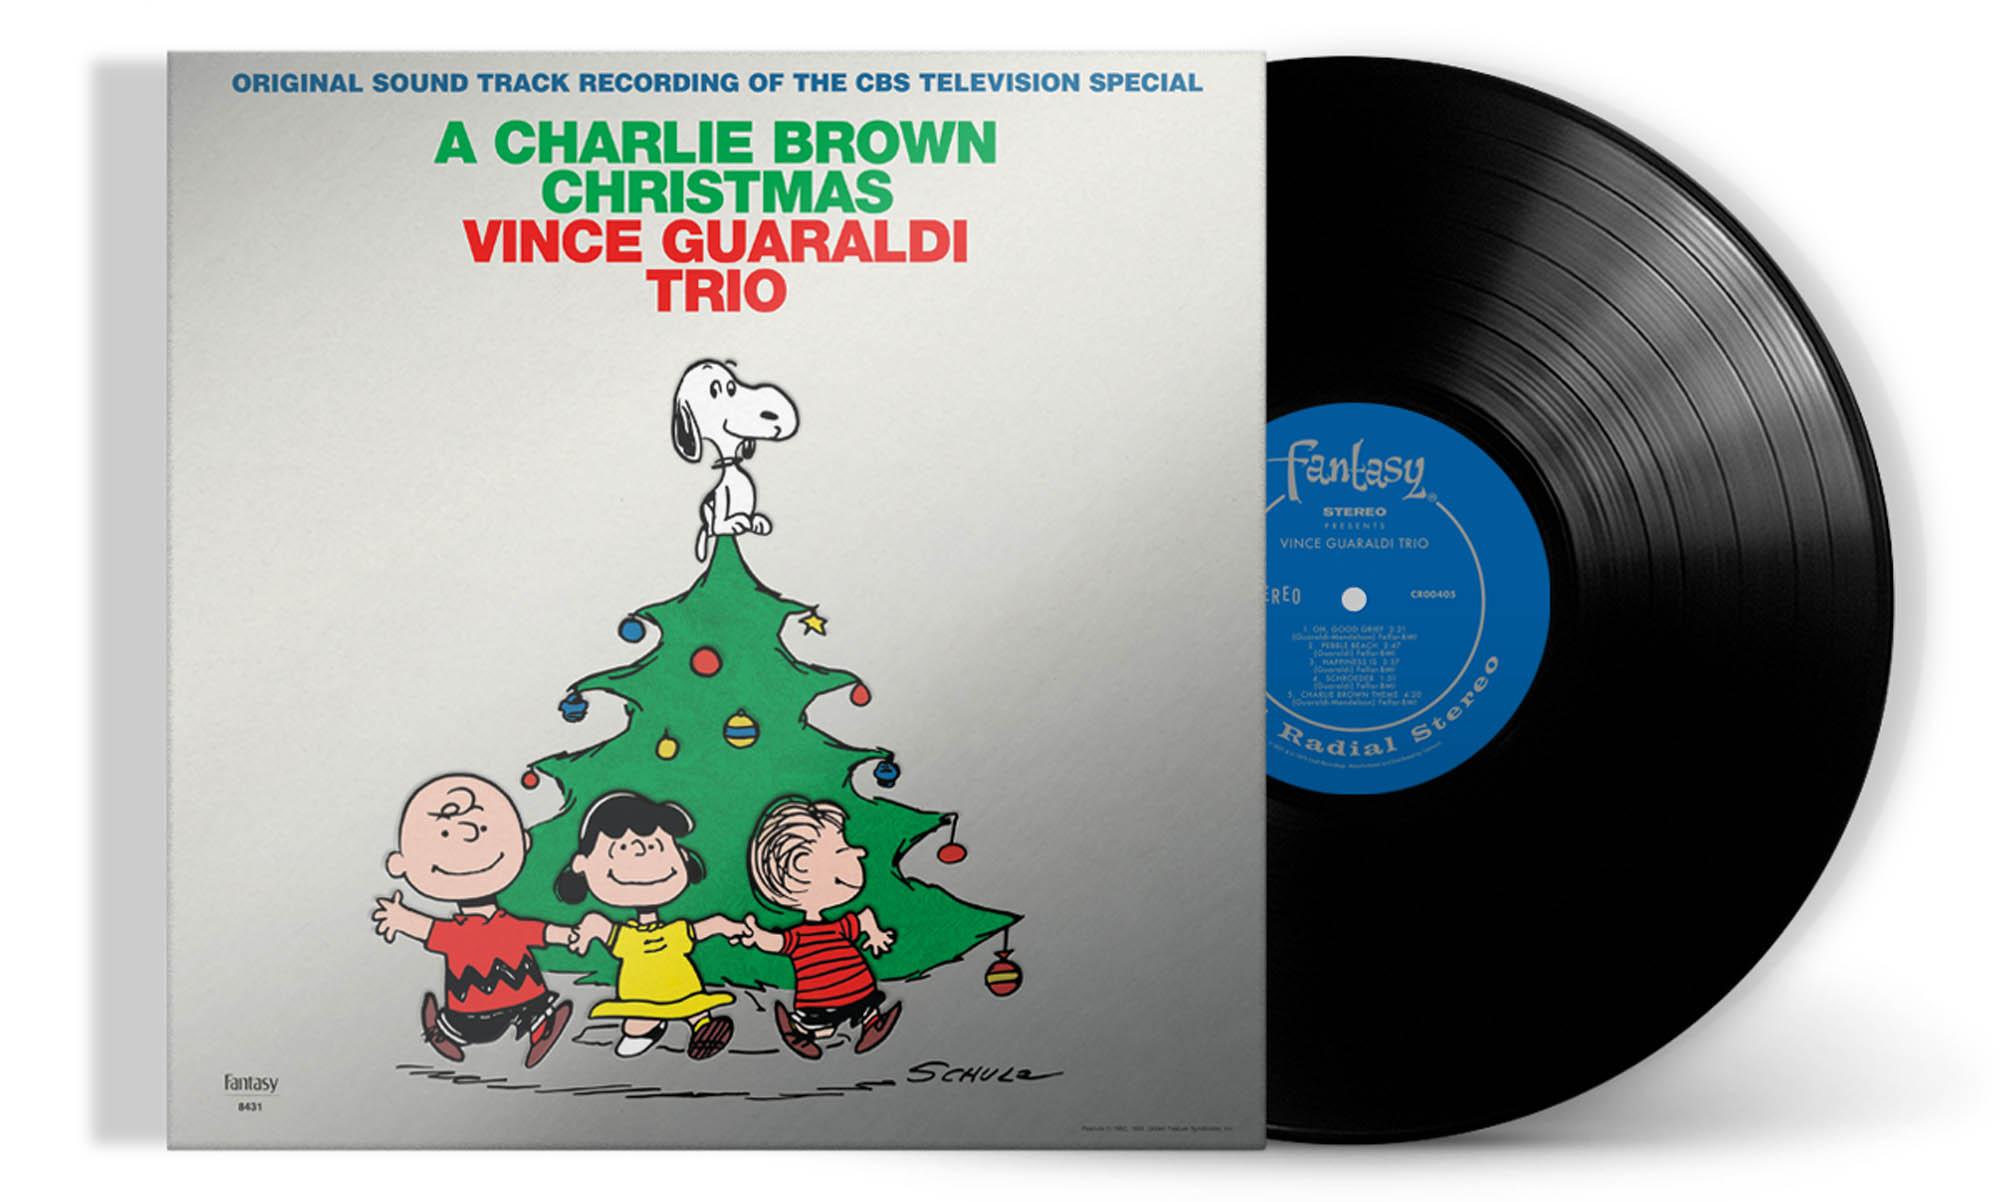 'A Charlie Brown Christmas' - Vinyl